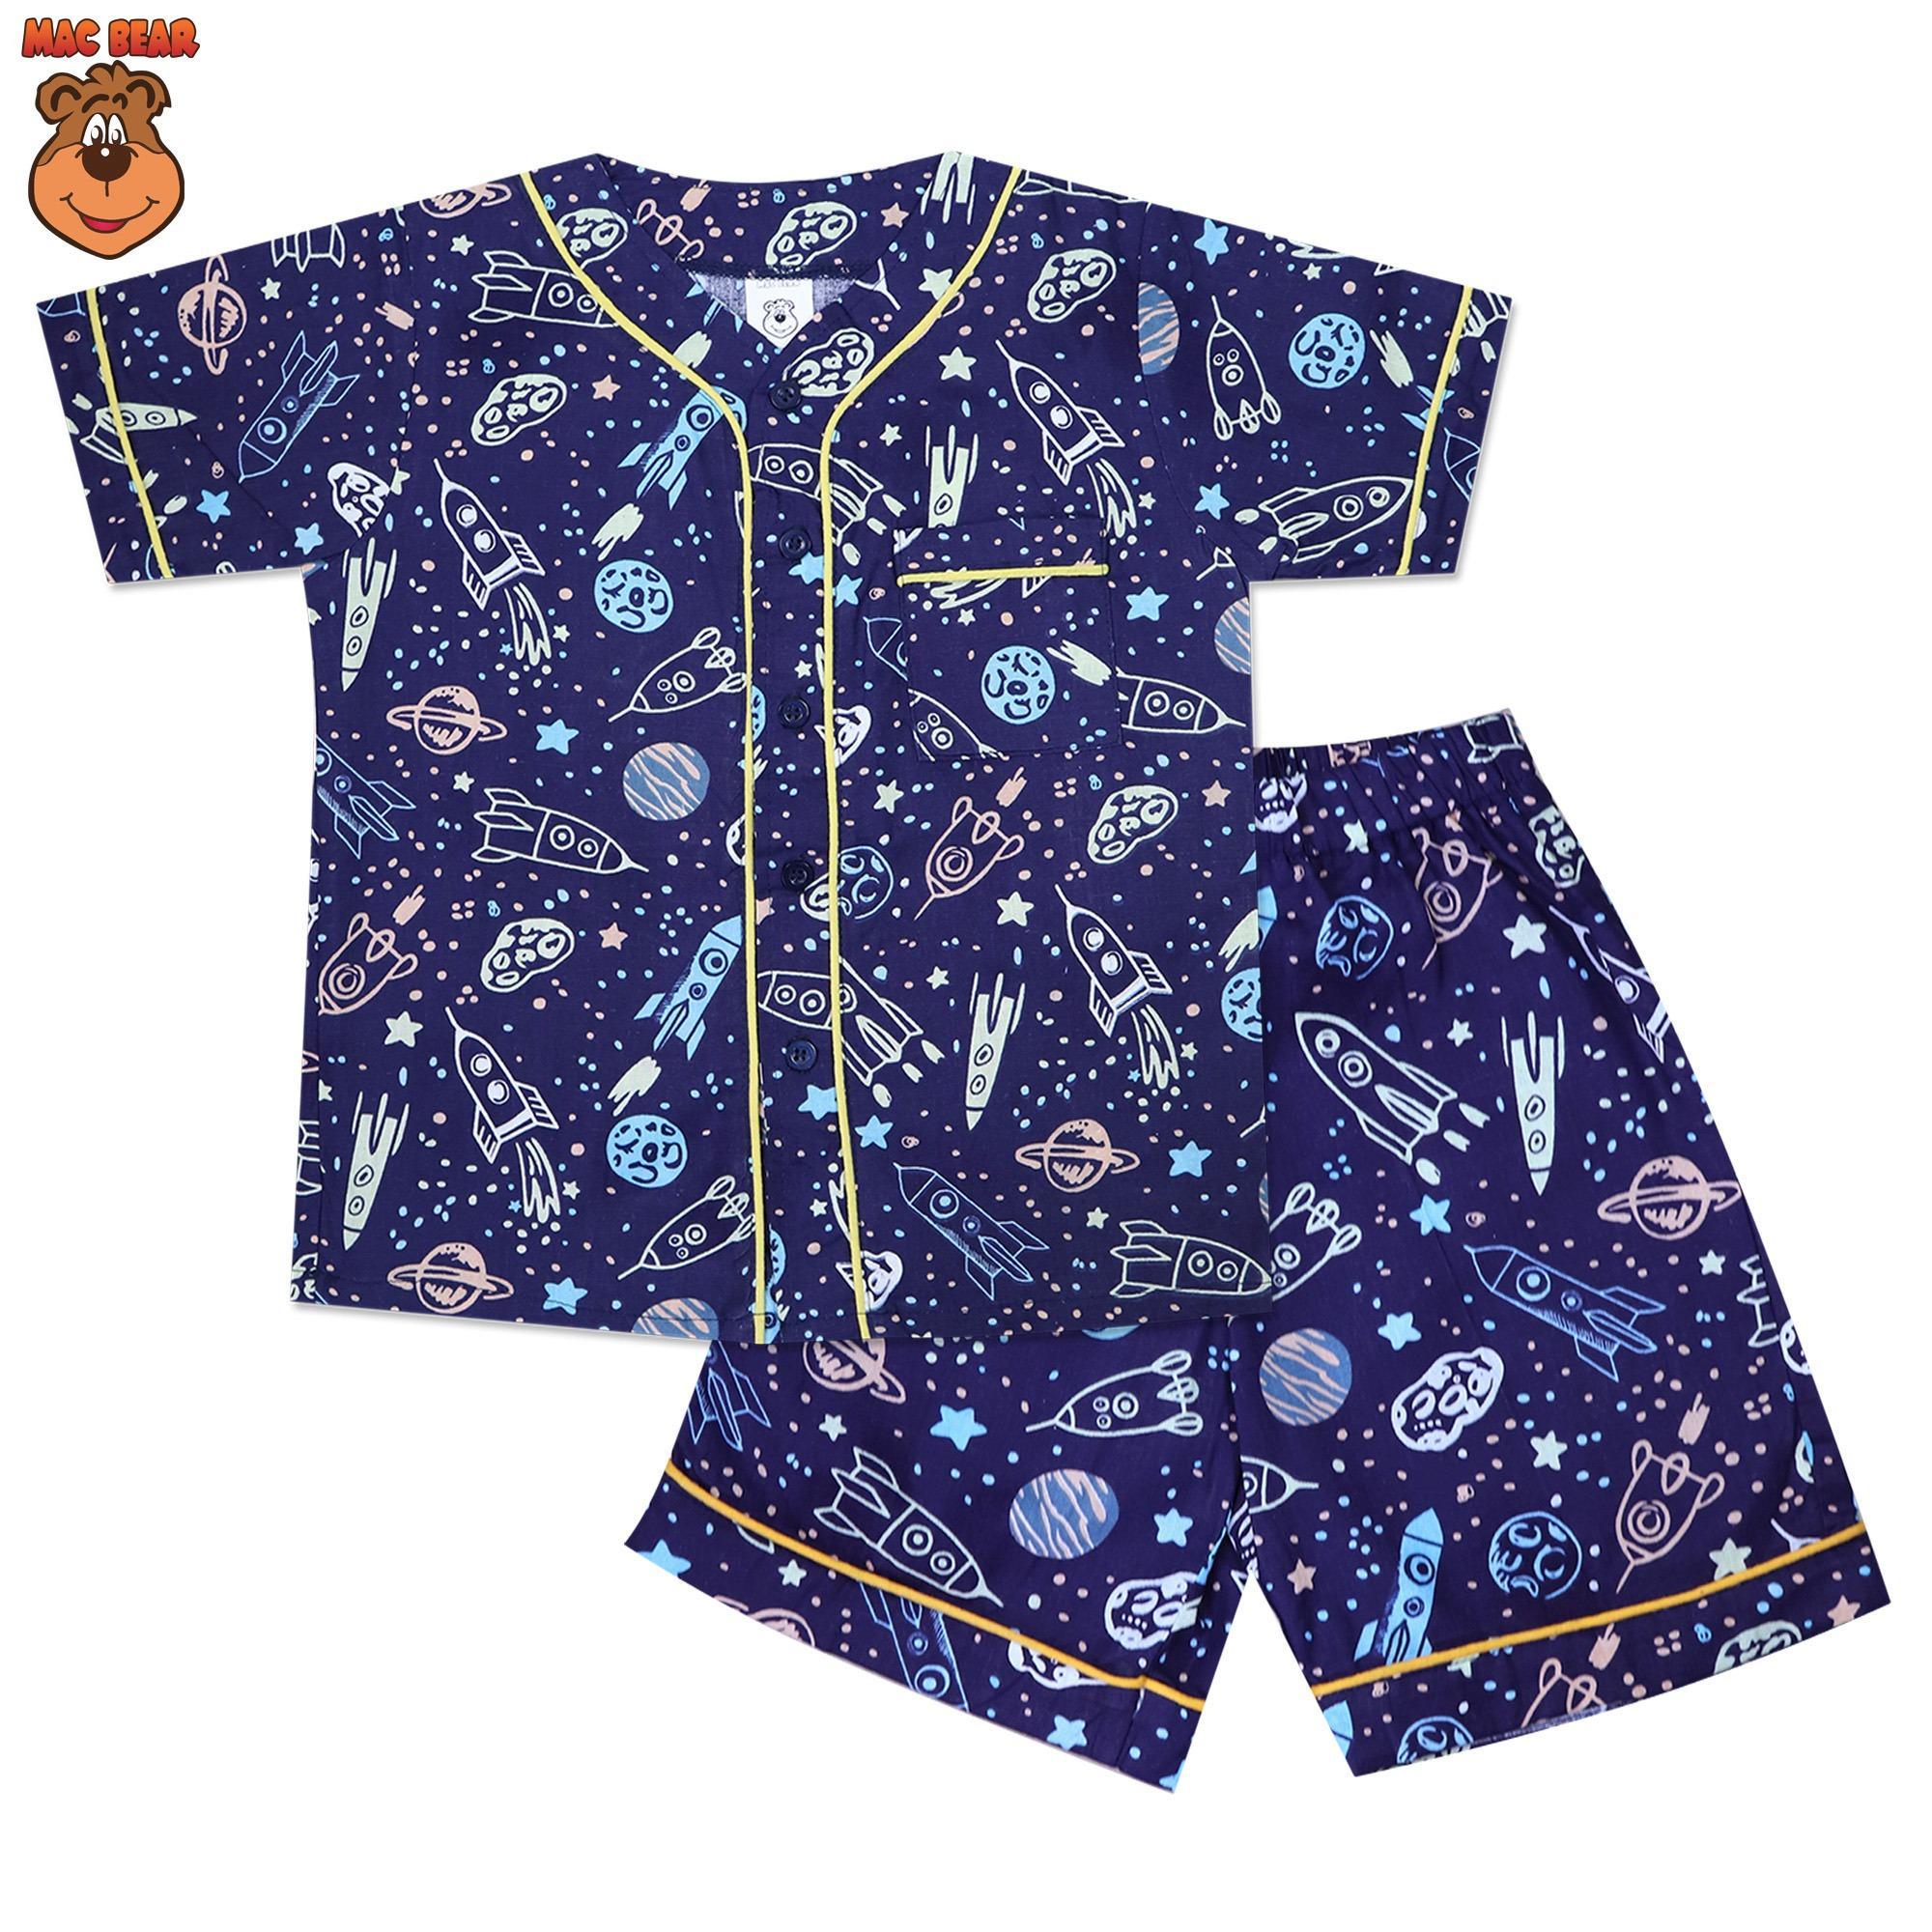 Cek Harga Baru Promo Baju Setelan Anak Laki London Kids Lk Kaos Celana Joger Pendek Macbear Galaxy Variasi